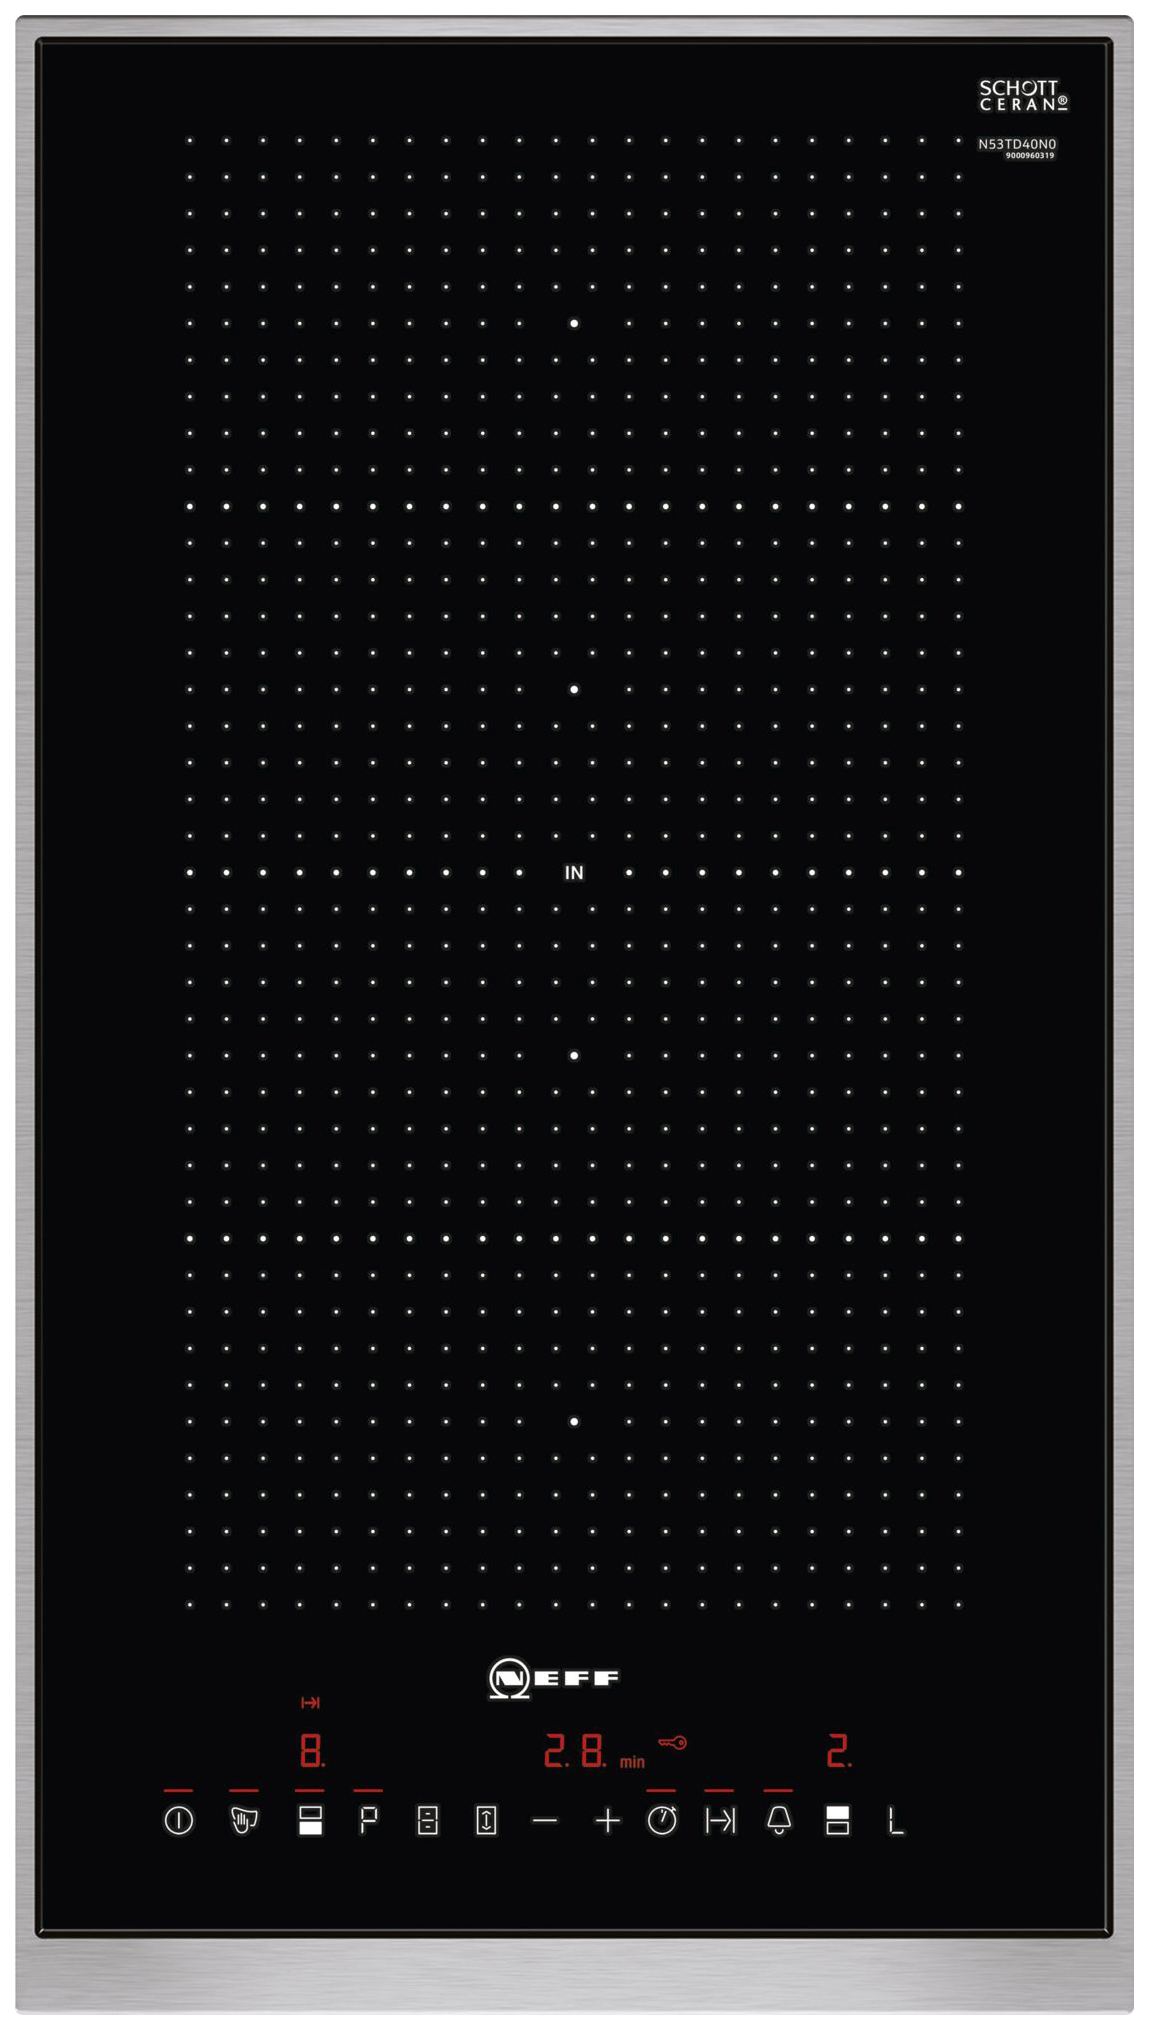 Встраиваемая варочная панель индукционная Neff N53TD40N0 Black